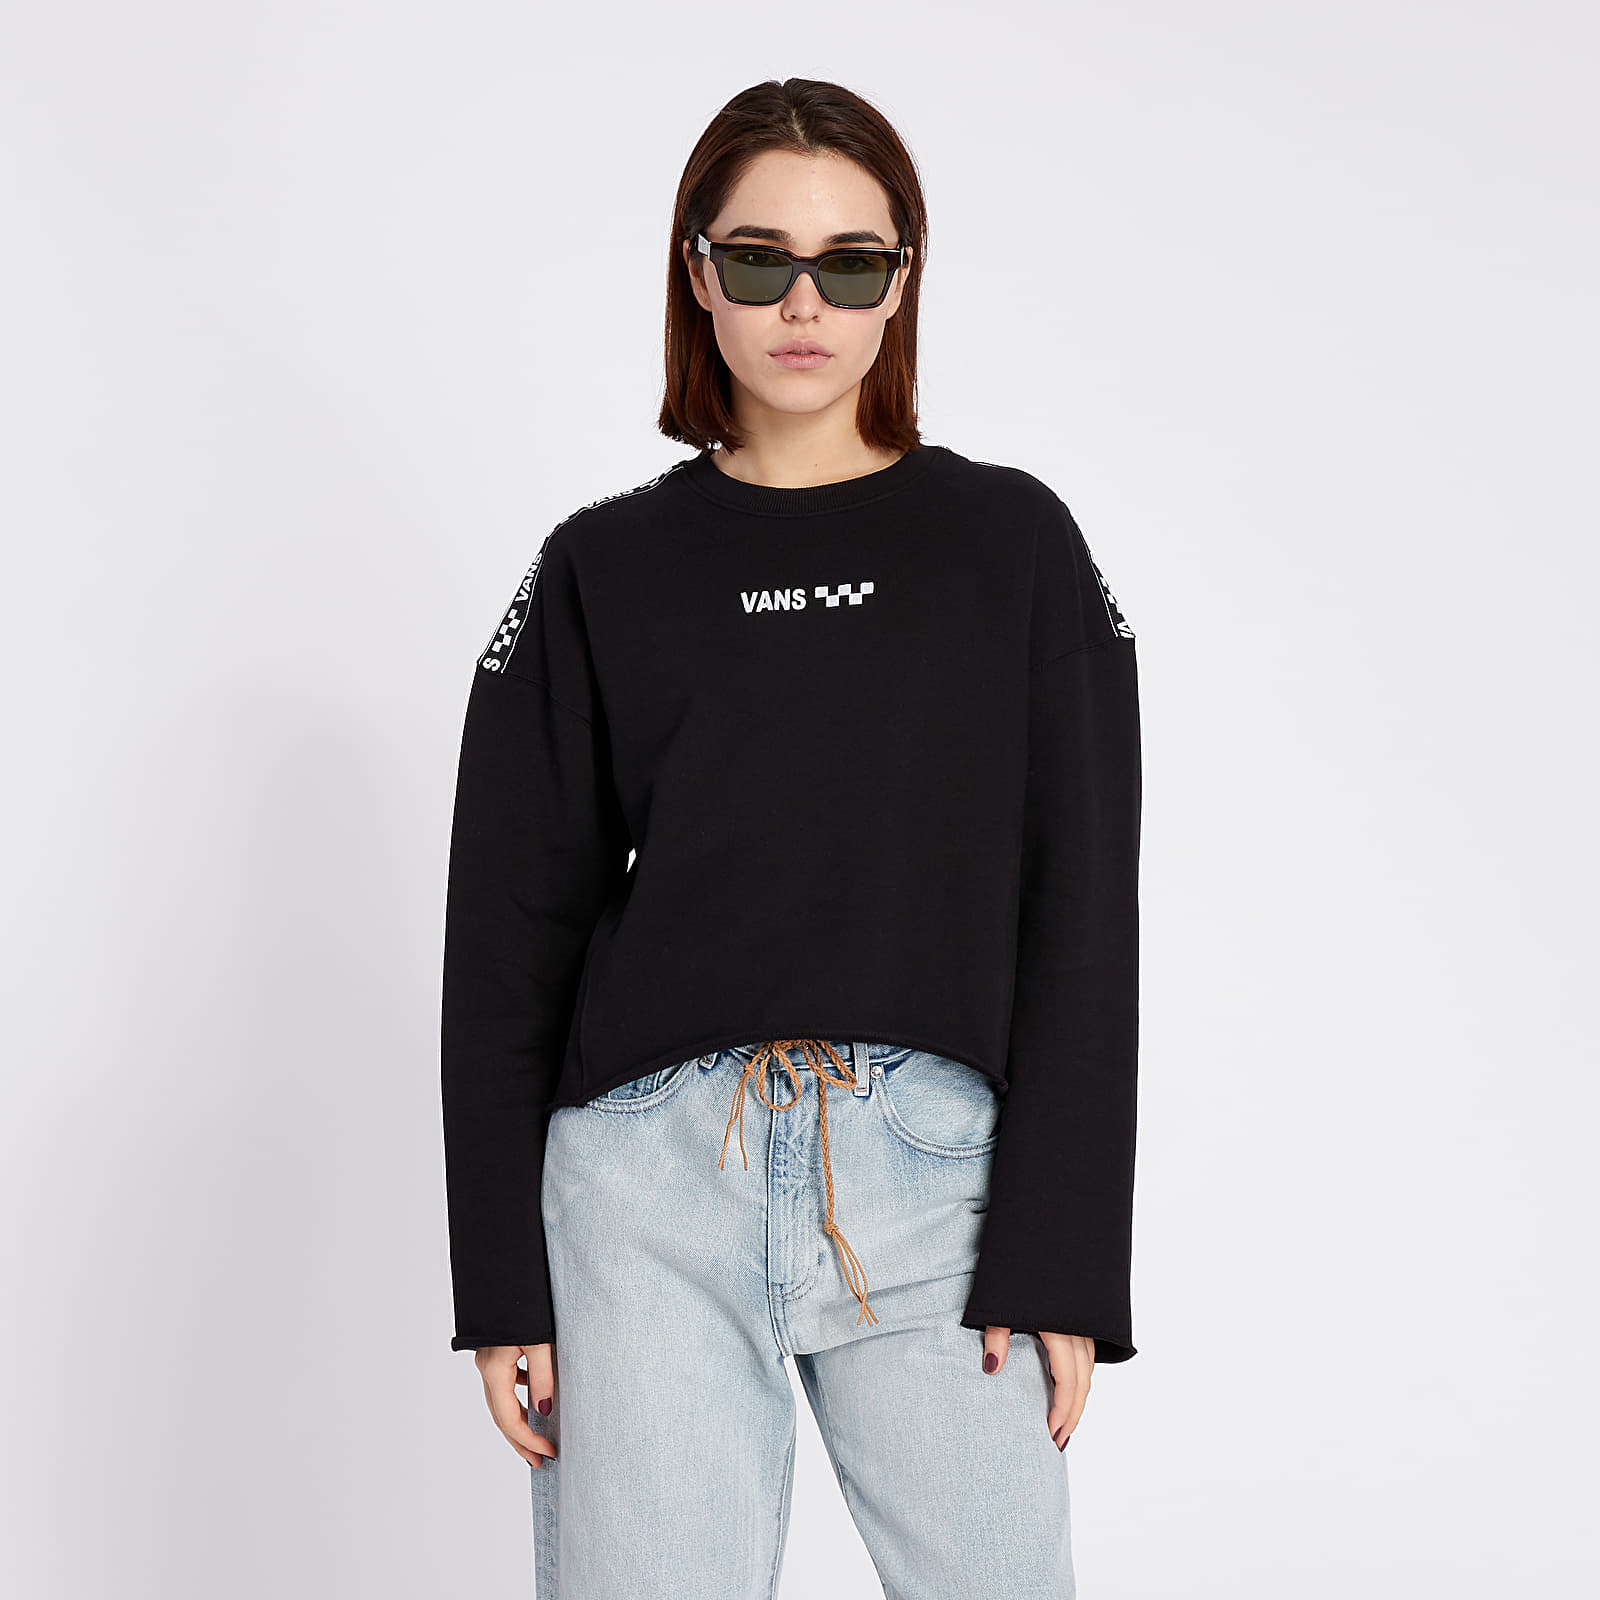 Sweatshirts Vans Brand Striper Crewneck Black